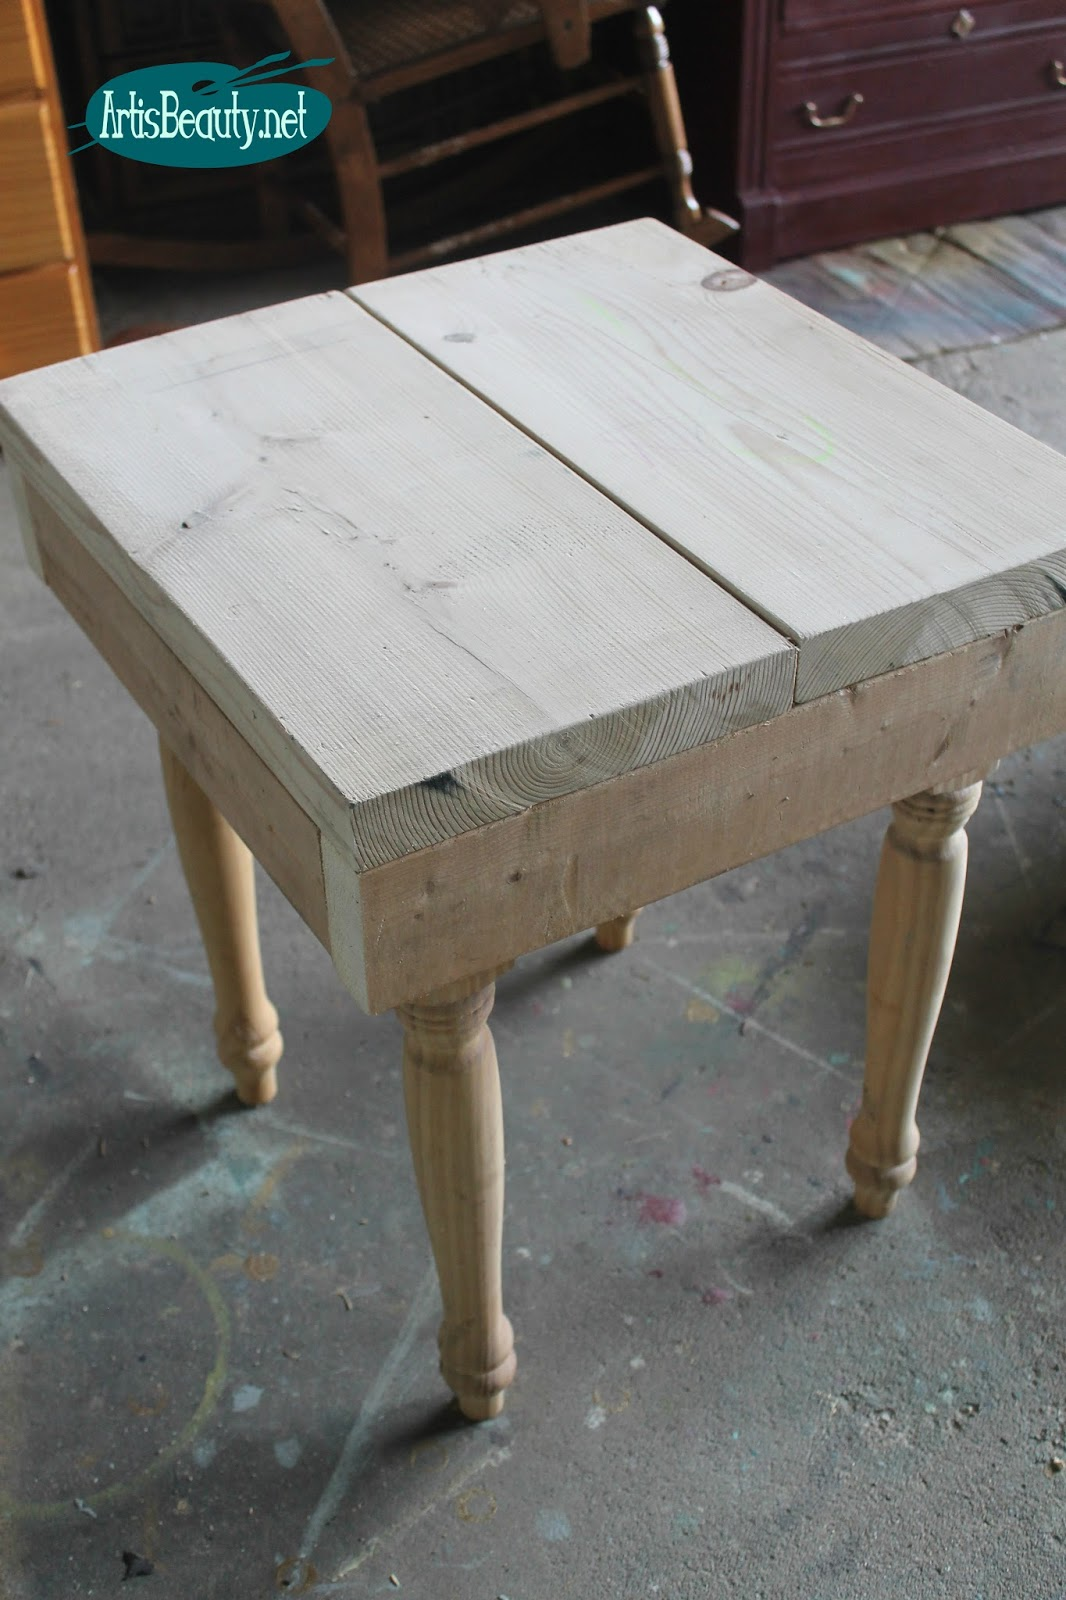 Diy industrial table - Custom Built Diy Industrial Table Using Rescued Materials